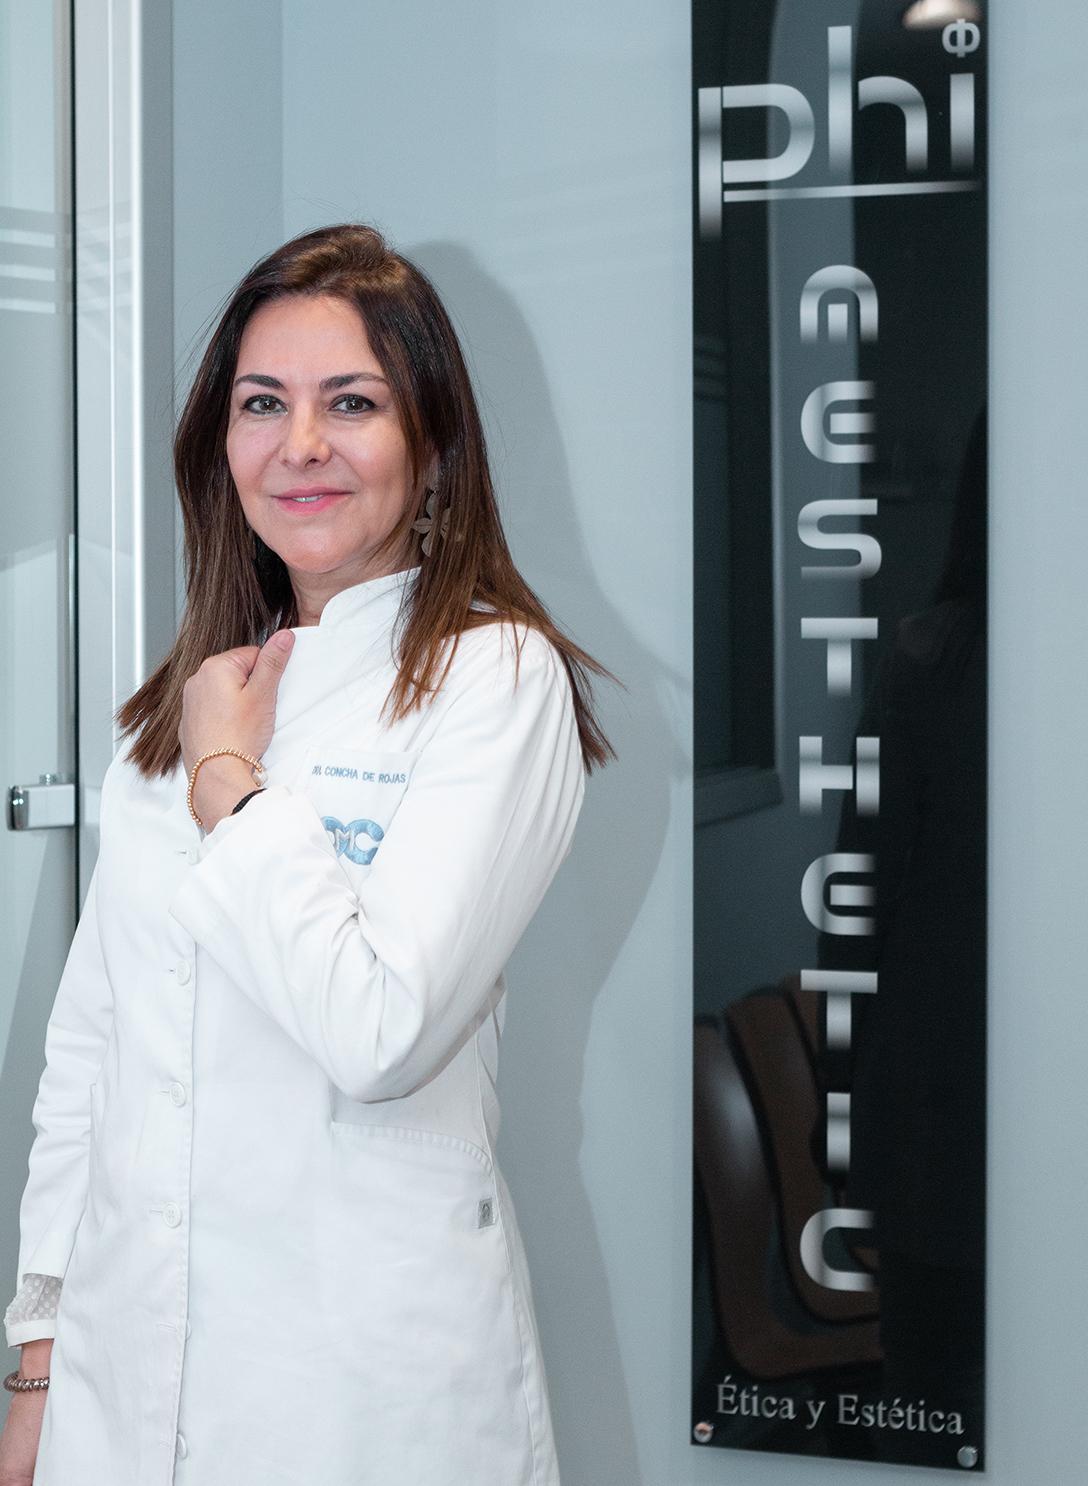 Dra. Inmaculada de Rojas Sarabia